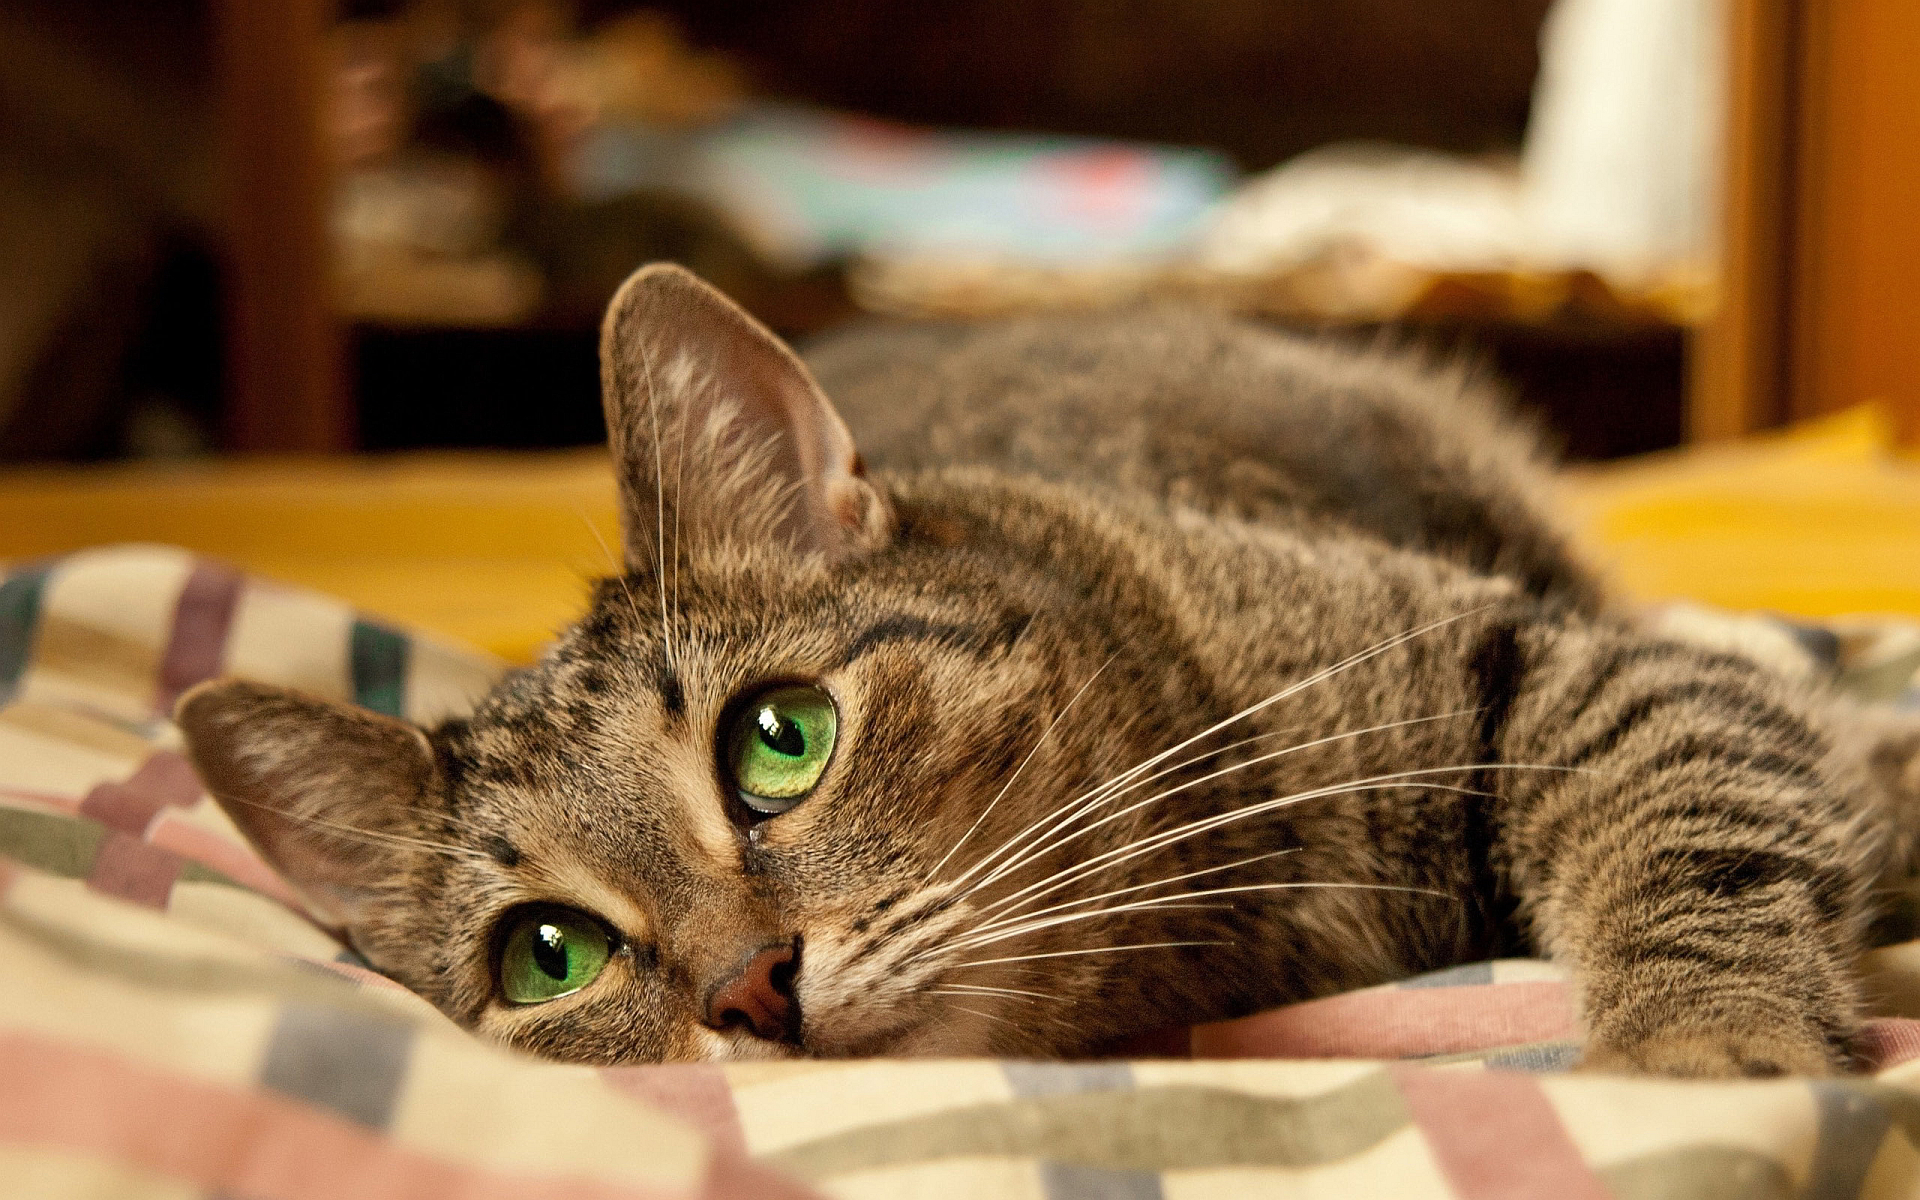 cute cat android wallpaper - HD Desktop Wallpapers   4k HD